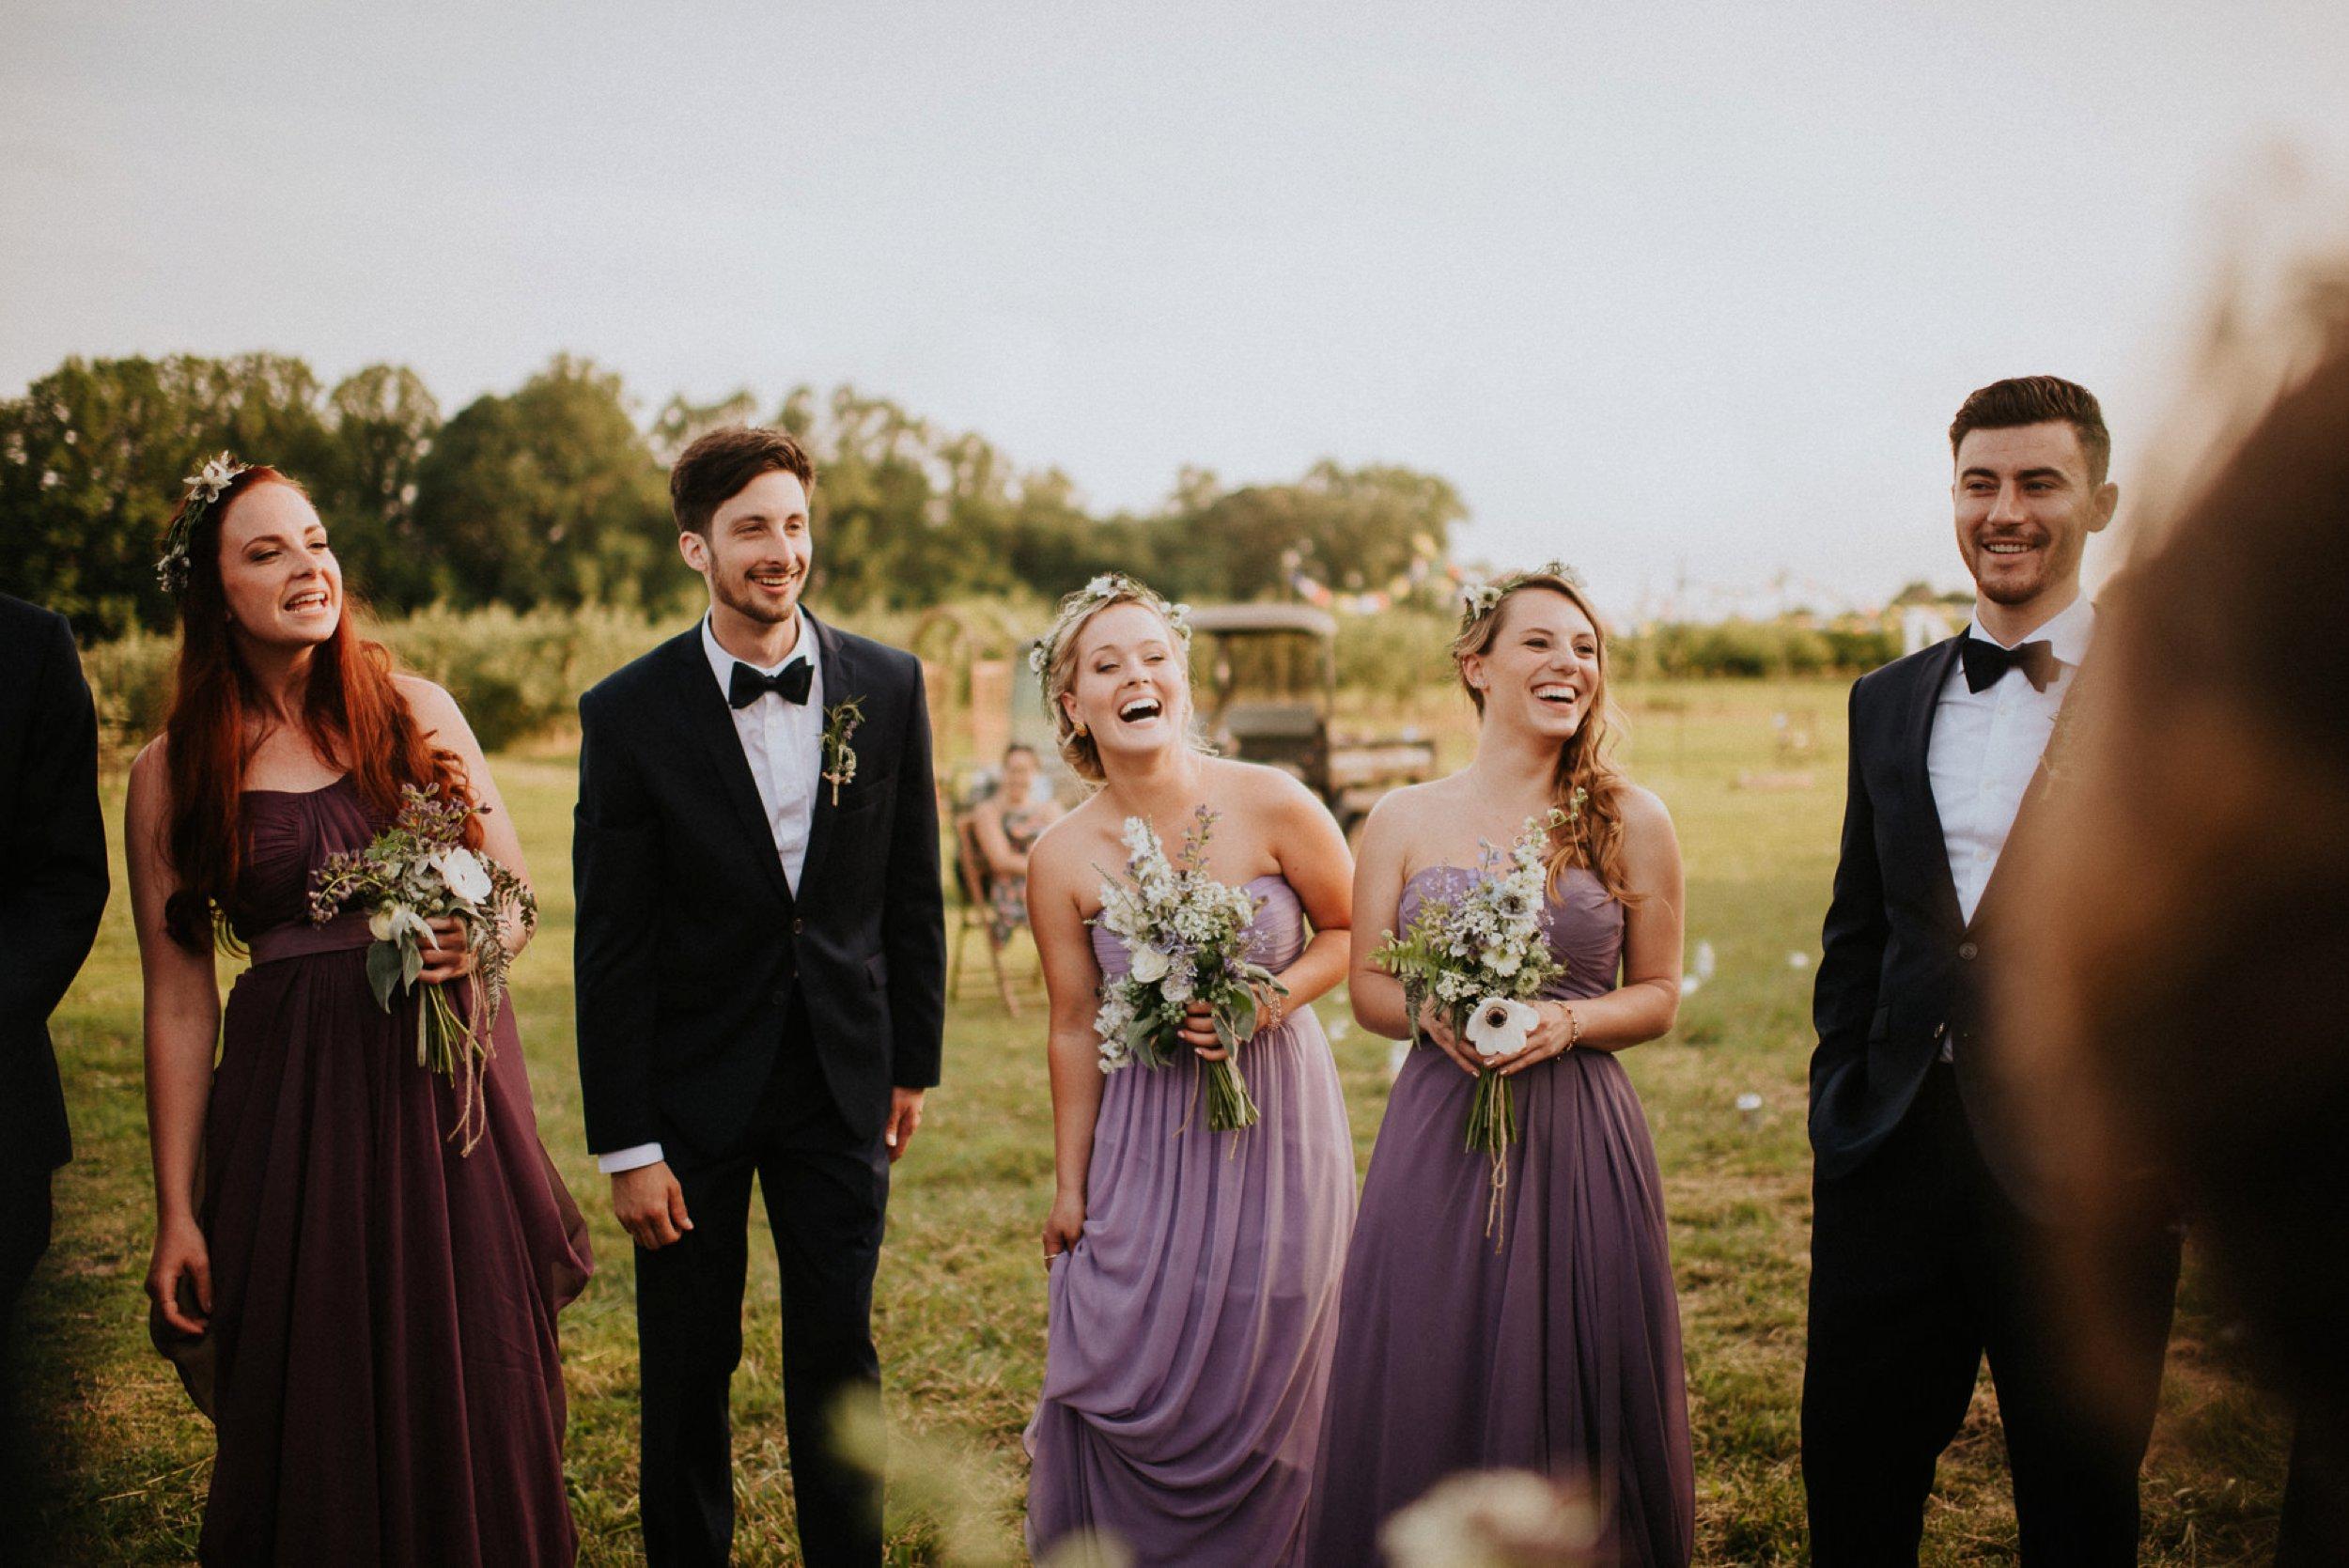 milburn_farms-wedding-54.jpg